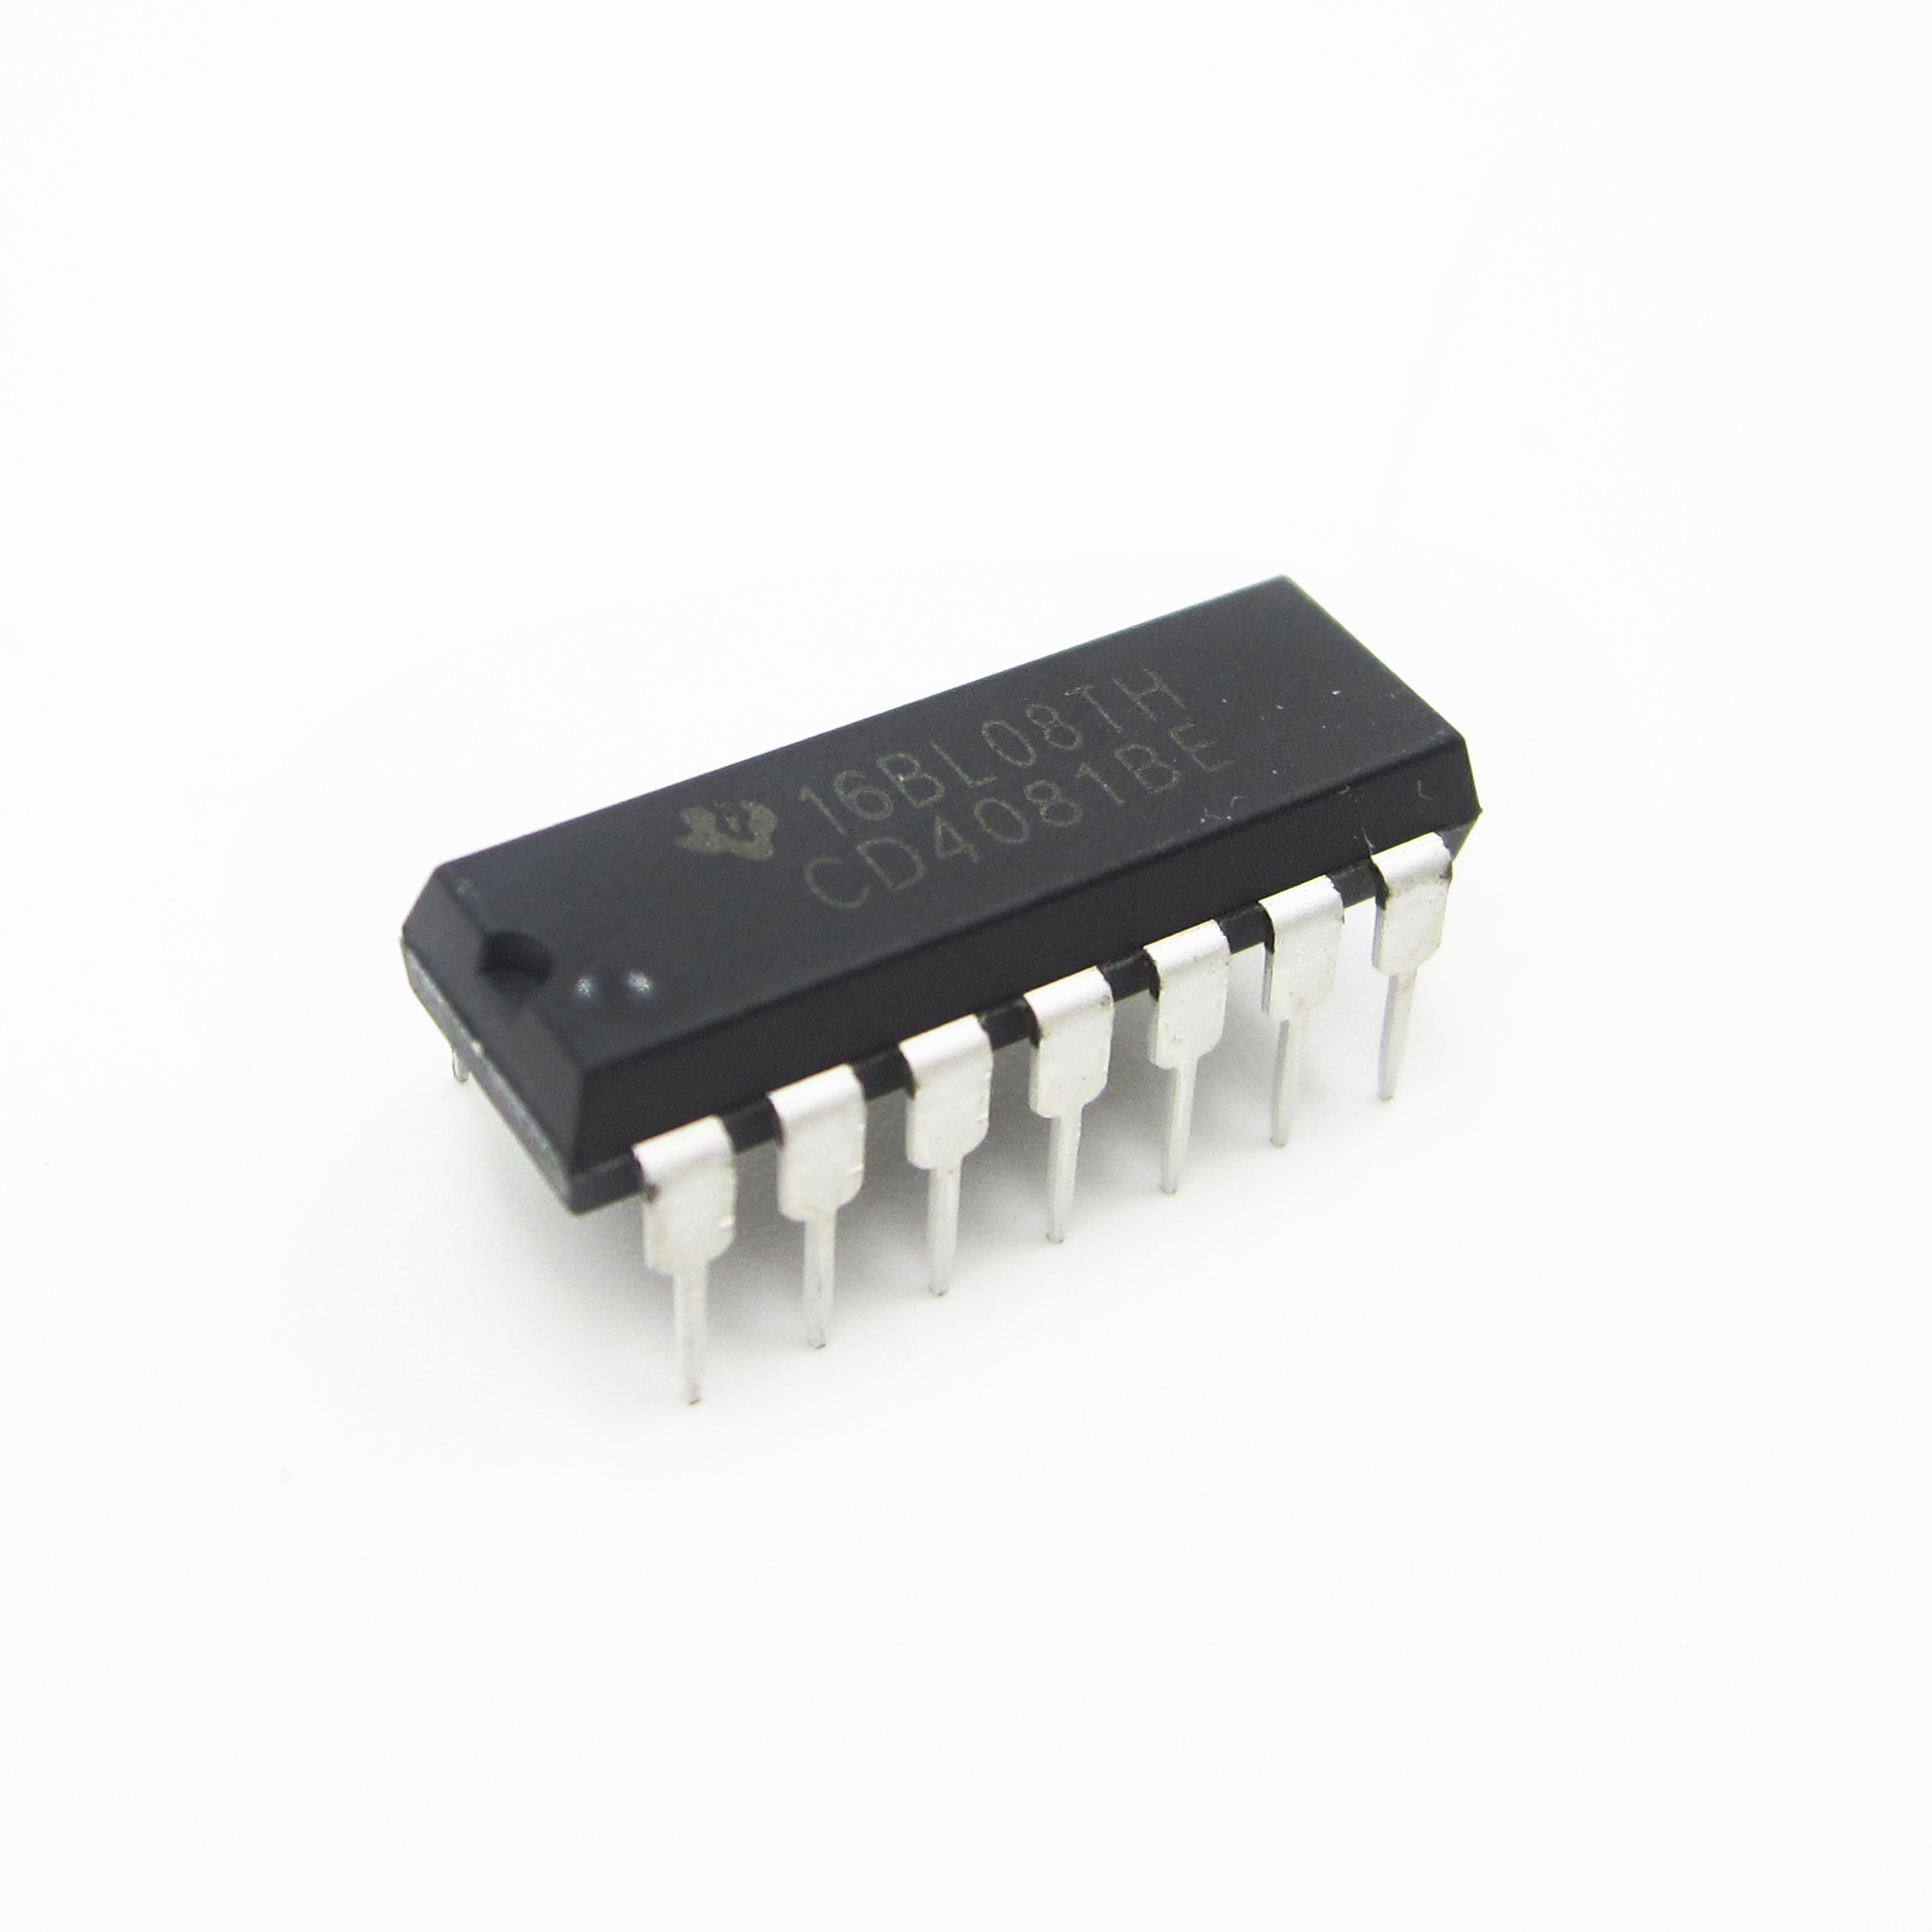 10pcs CD4081 DIP 14 CD4081BE Quad 2 Input Or And Gate Original DIP-14 TI Chip IC